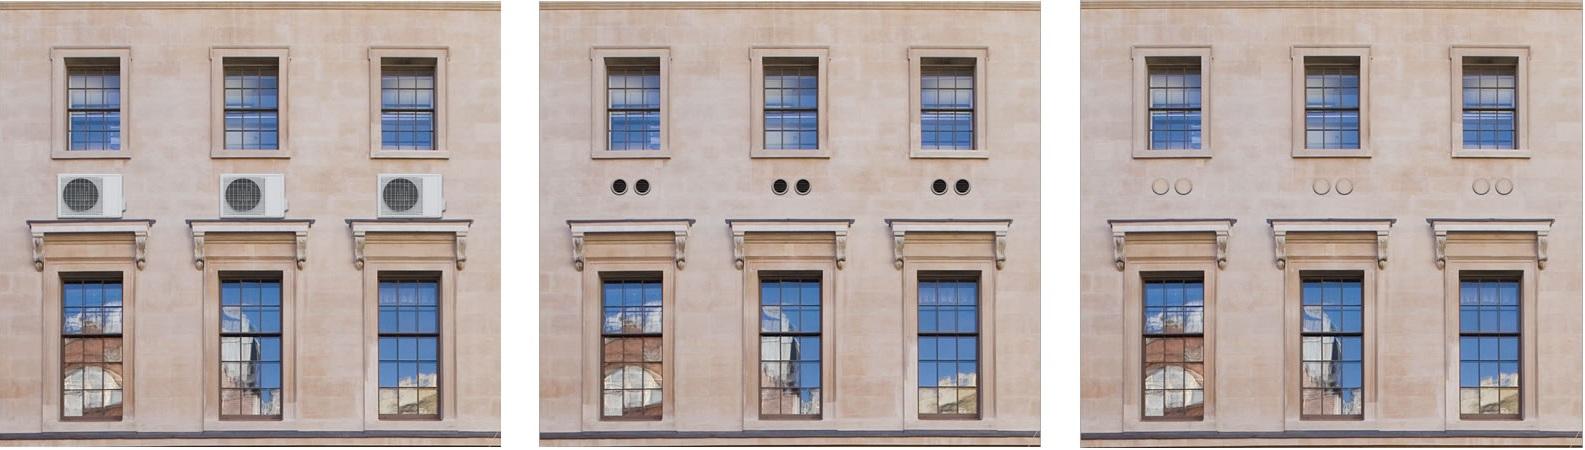 Termal Only in fasada